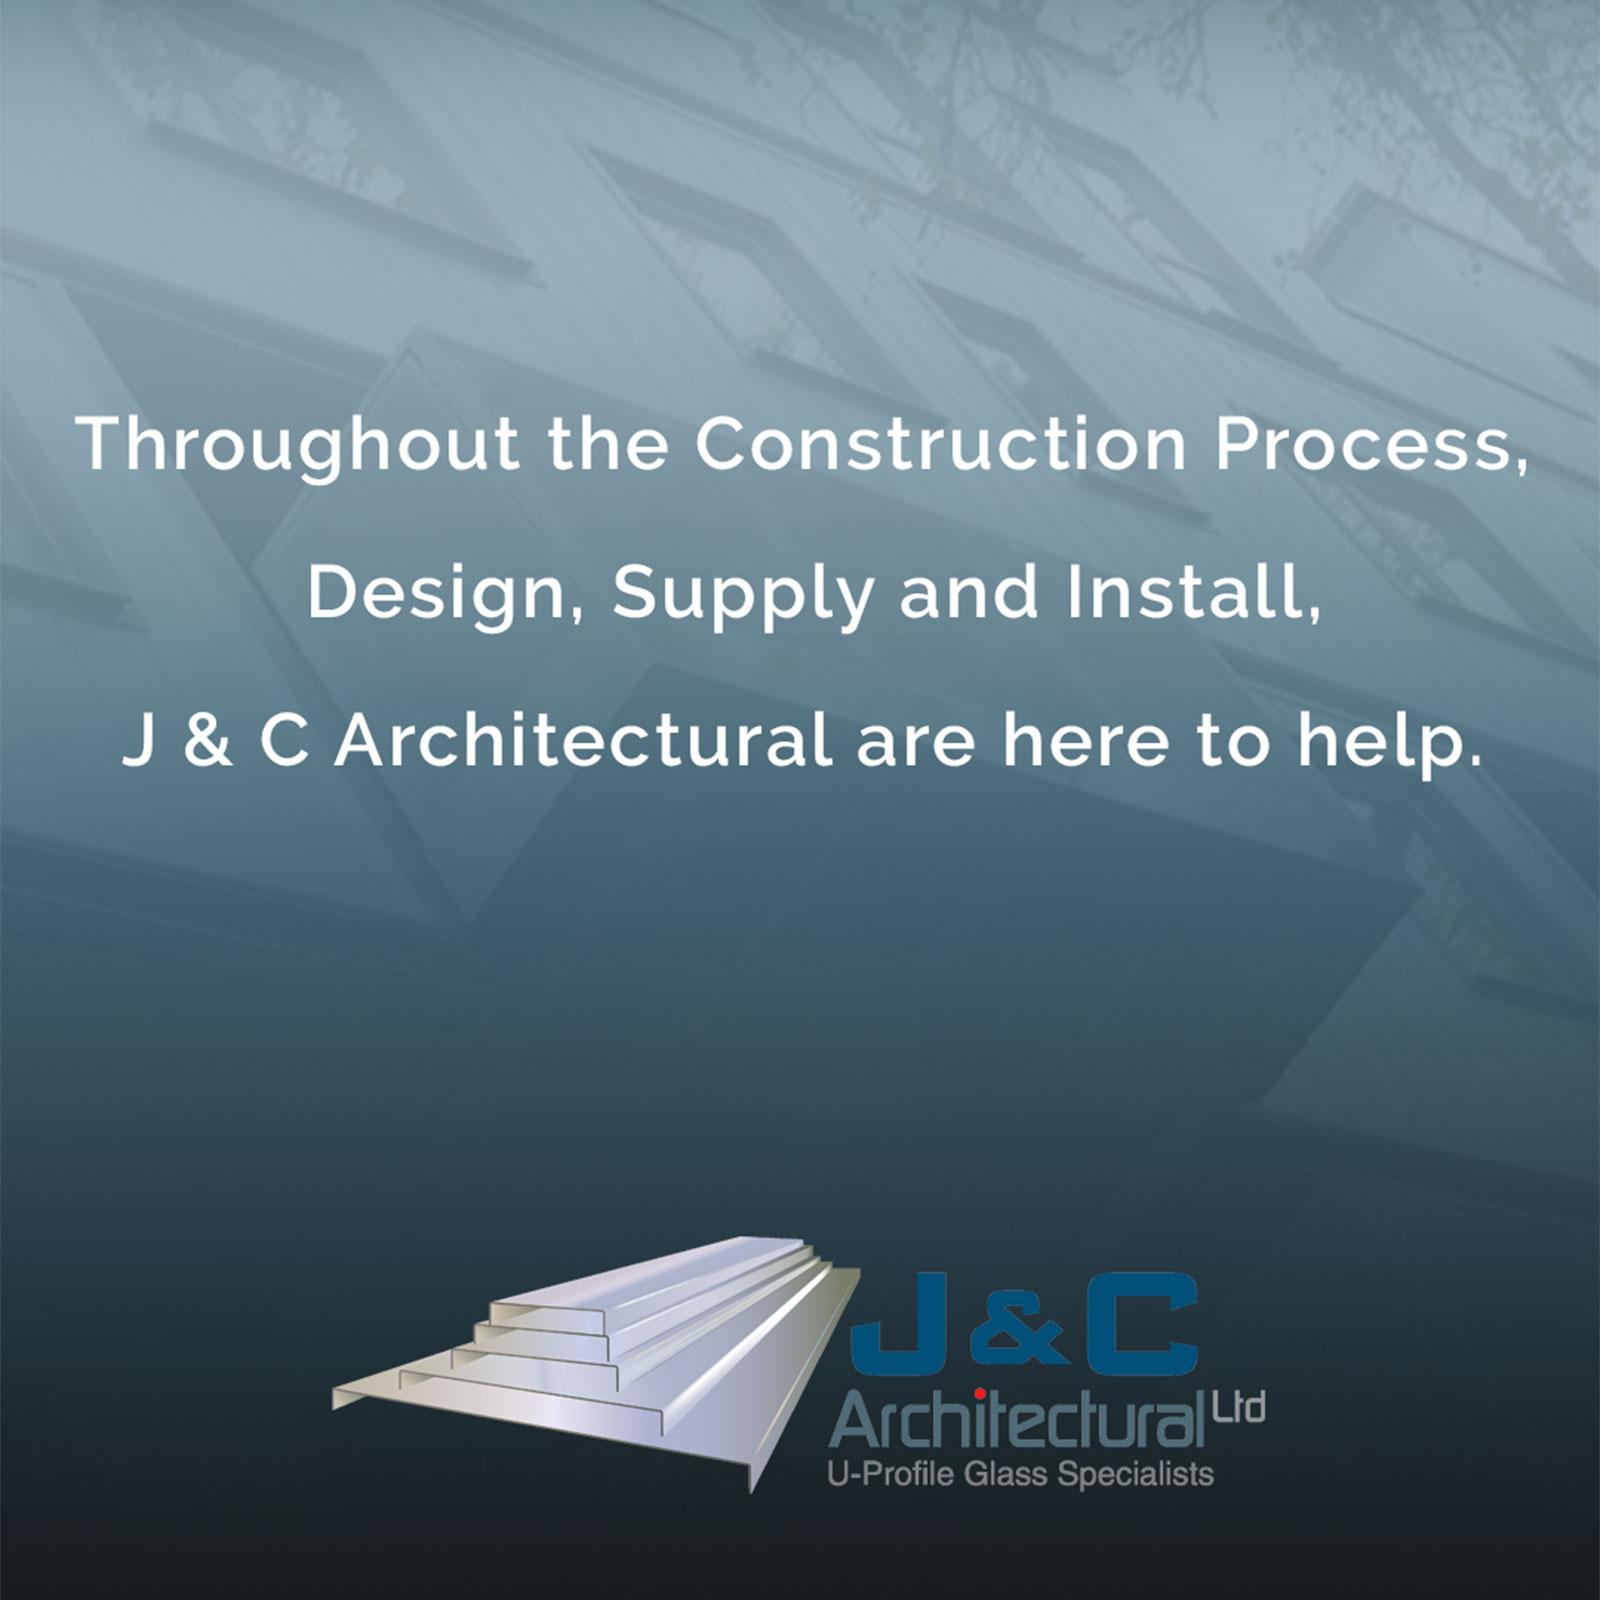 J&C Architectural